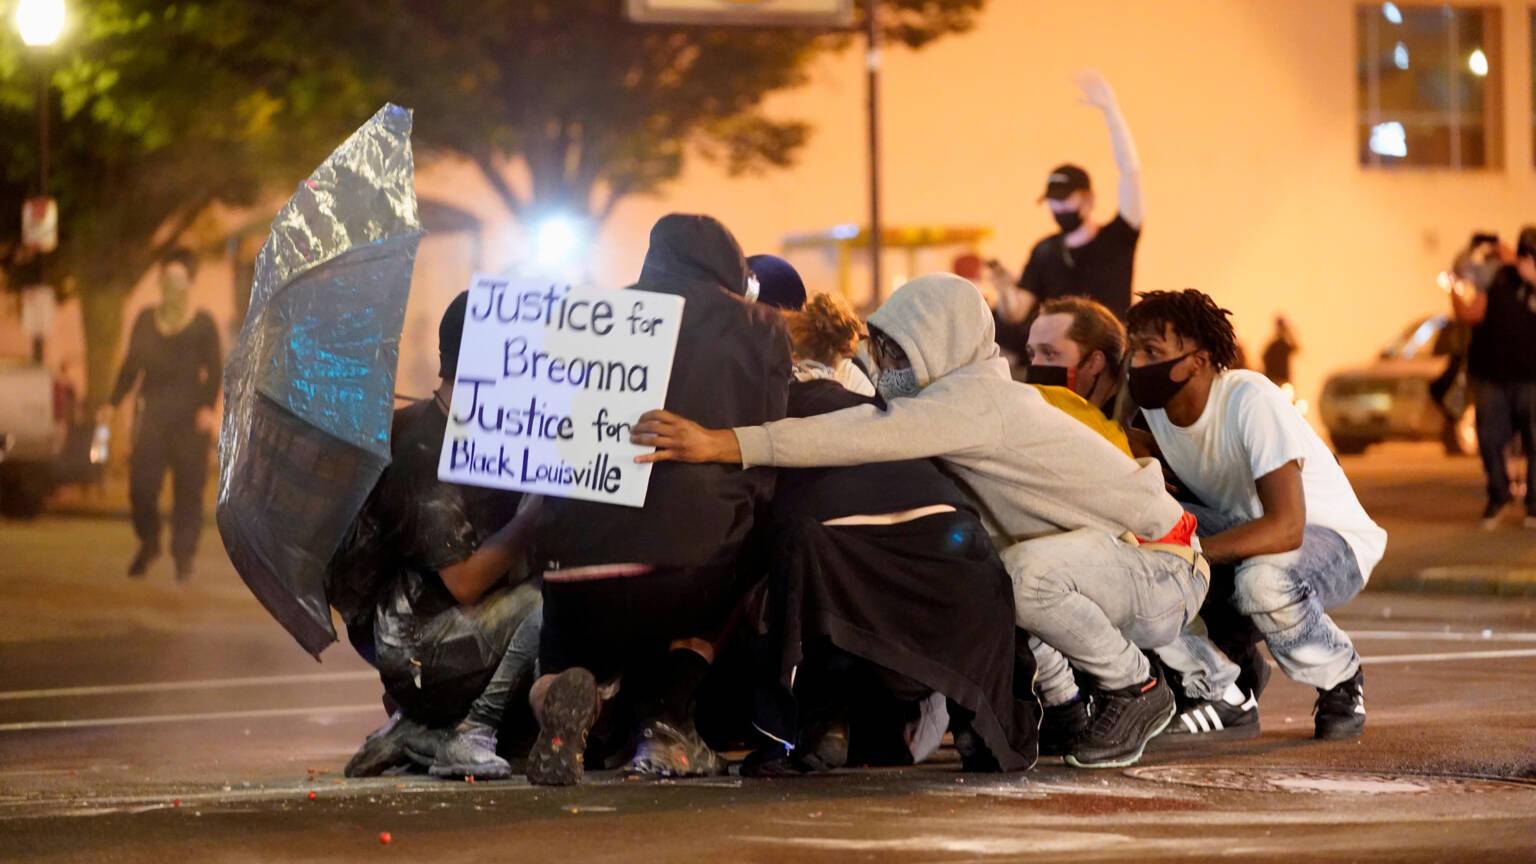 Demonstrators in Louisville, Kentucky, USA